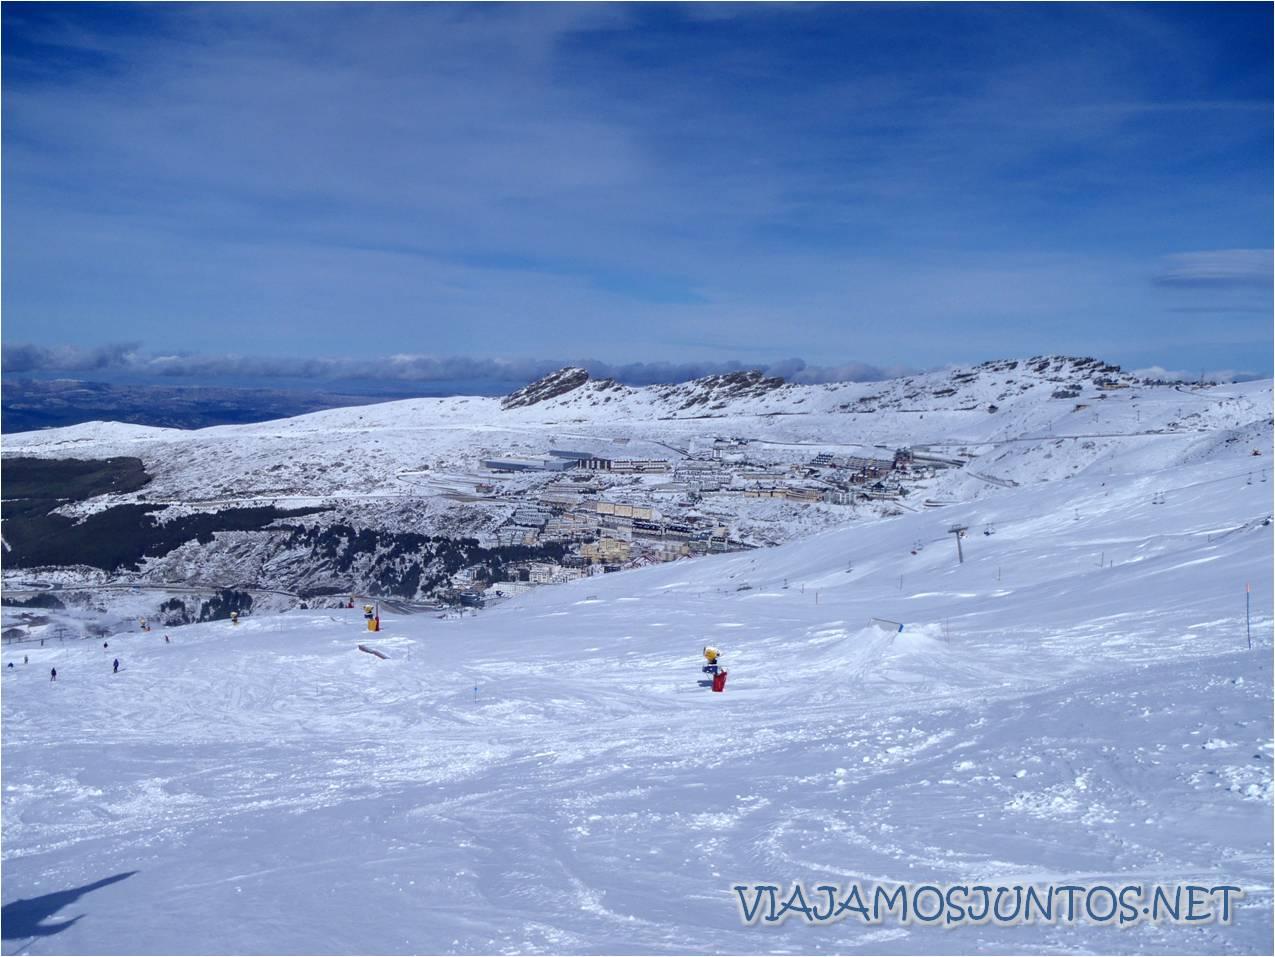 Sierra Nevada, esquí, esquiar, nieve, mono de nieve, san valentín, casco, seguridad, Andalucía